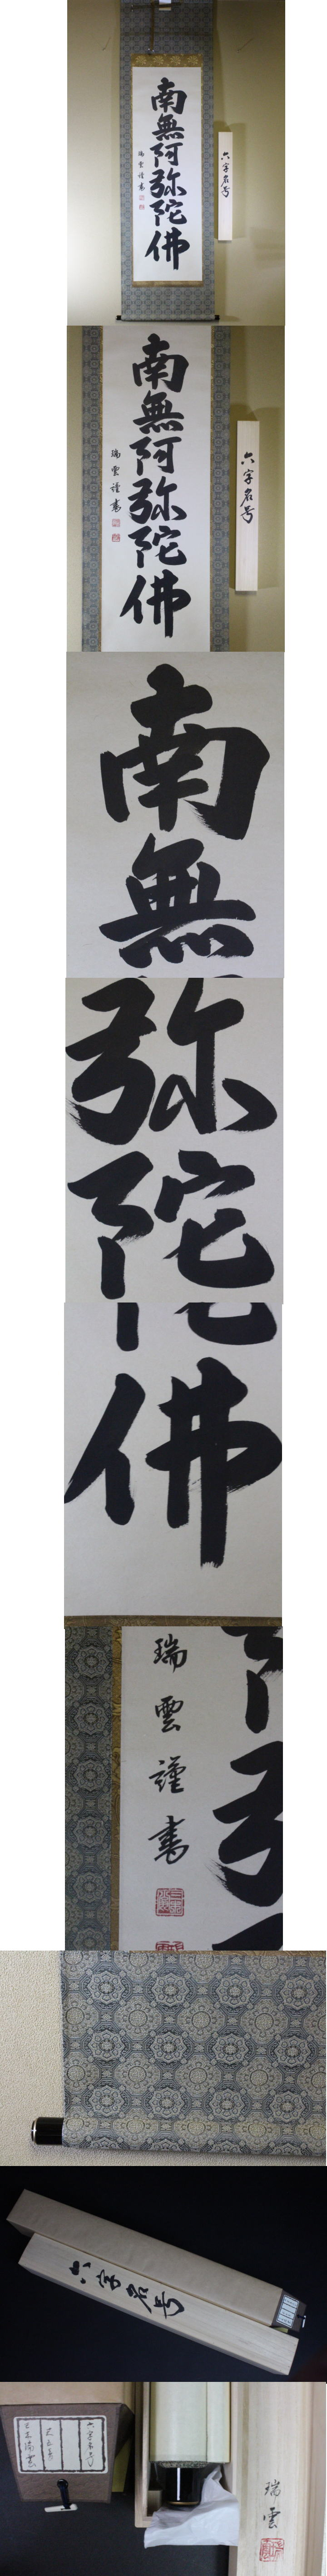 butujikumiki2